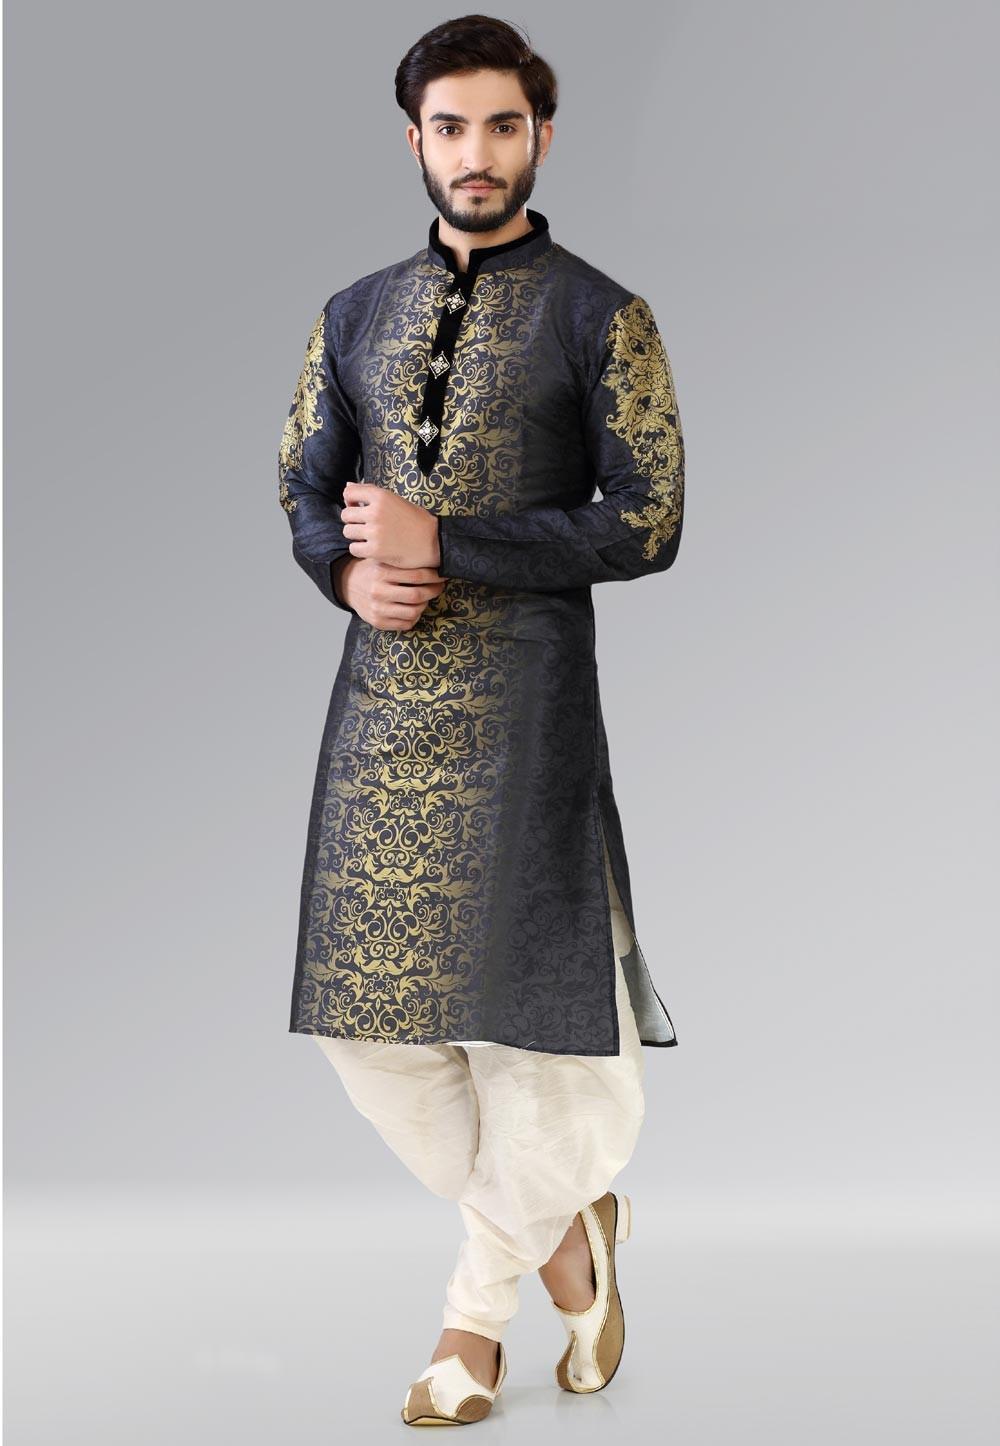 Astounding Black,Golden Color Readymade Kurta Pajama.